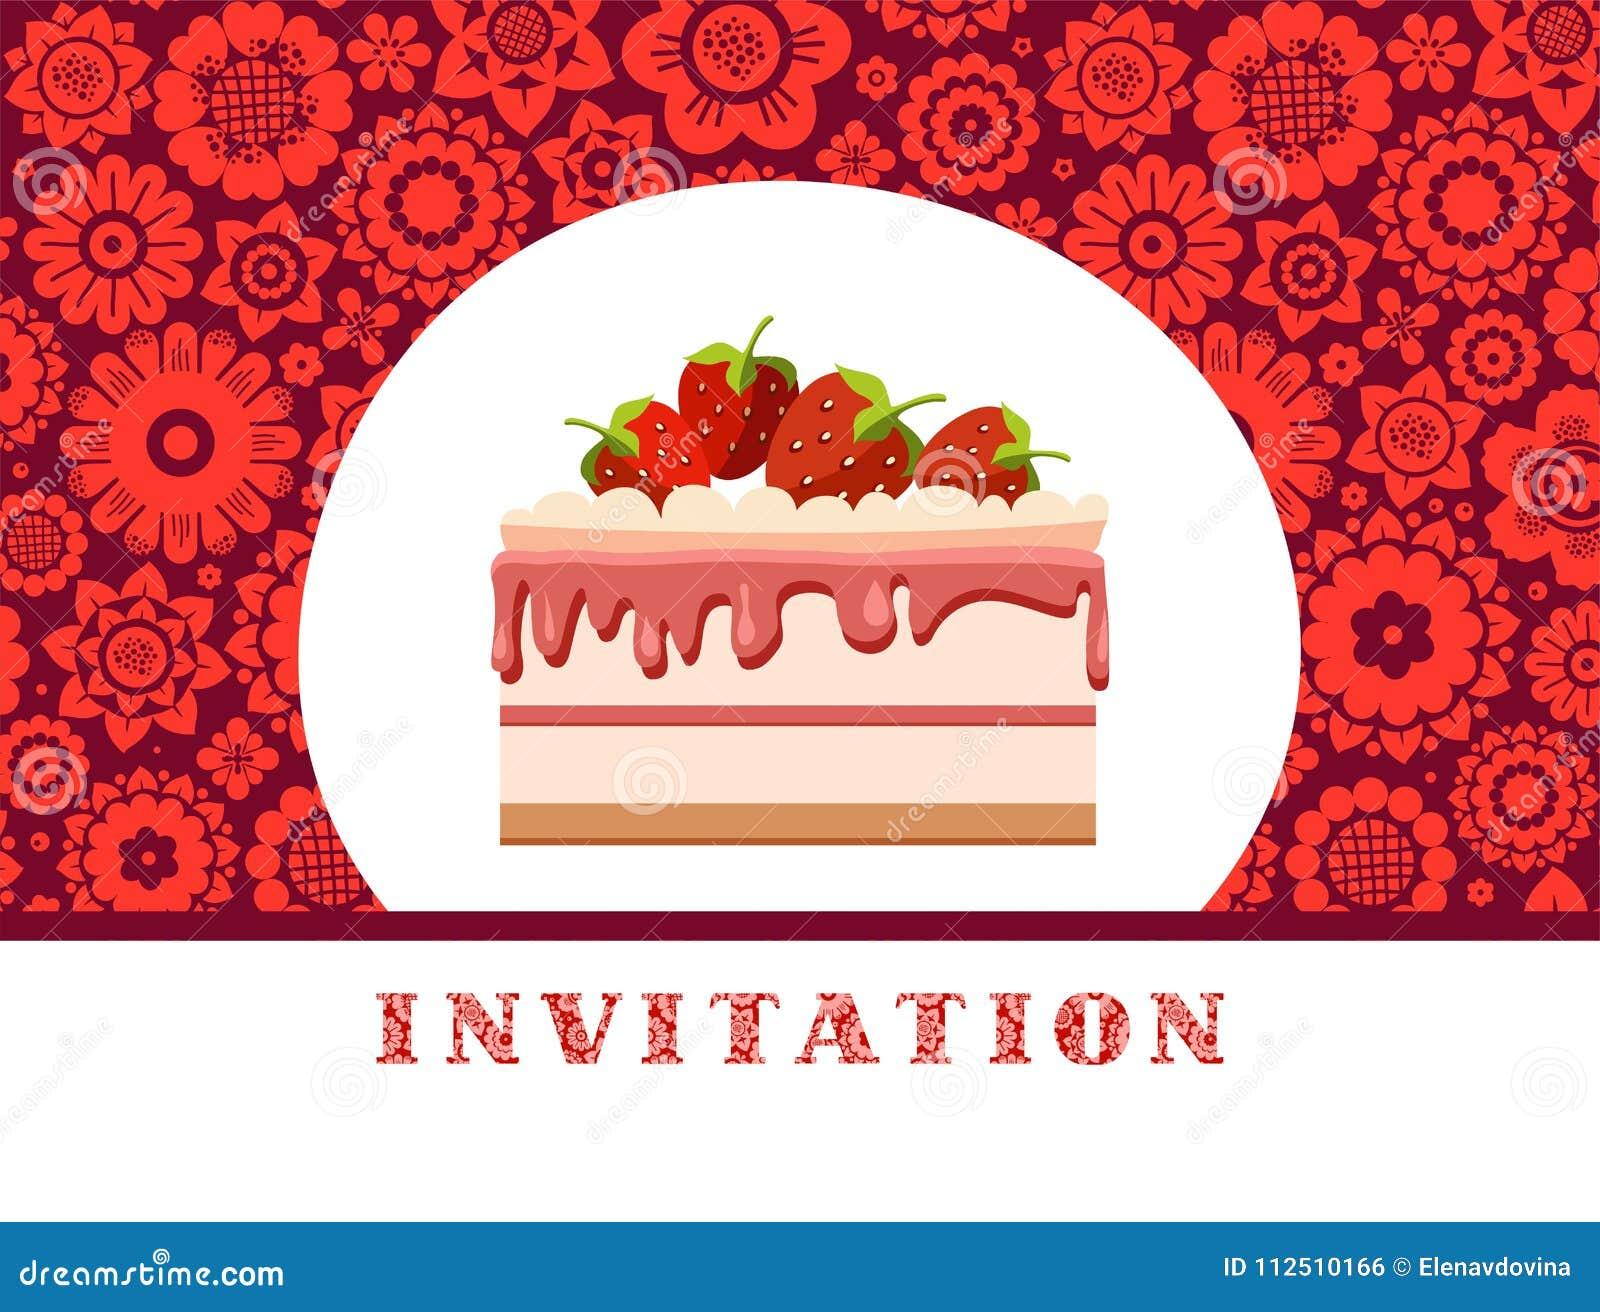 Invitation, Strawberry Cake, Dark Red, Floral Background, Vector ...